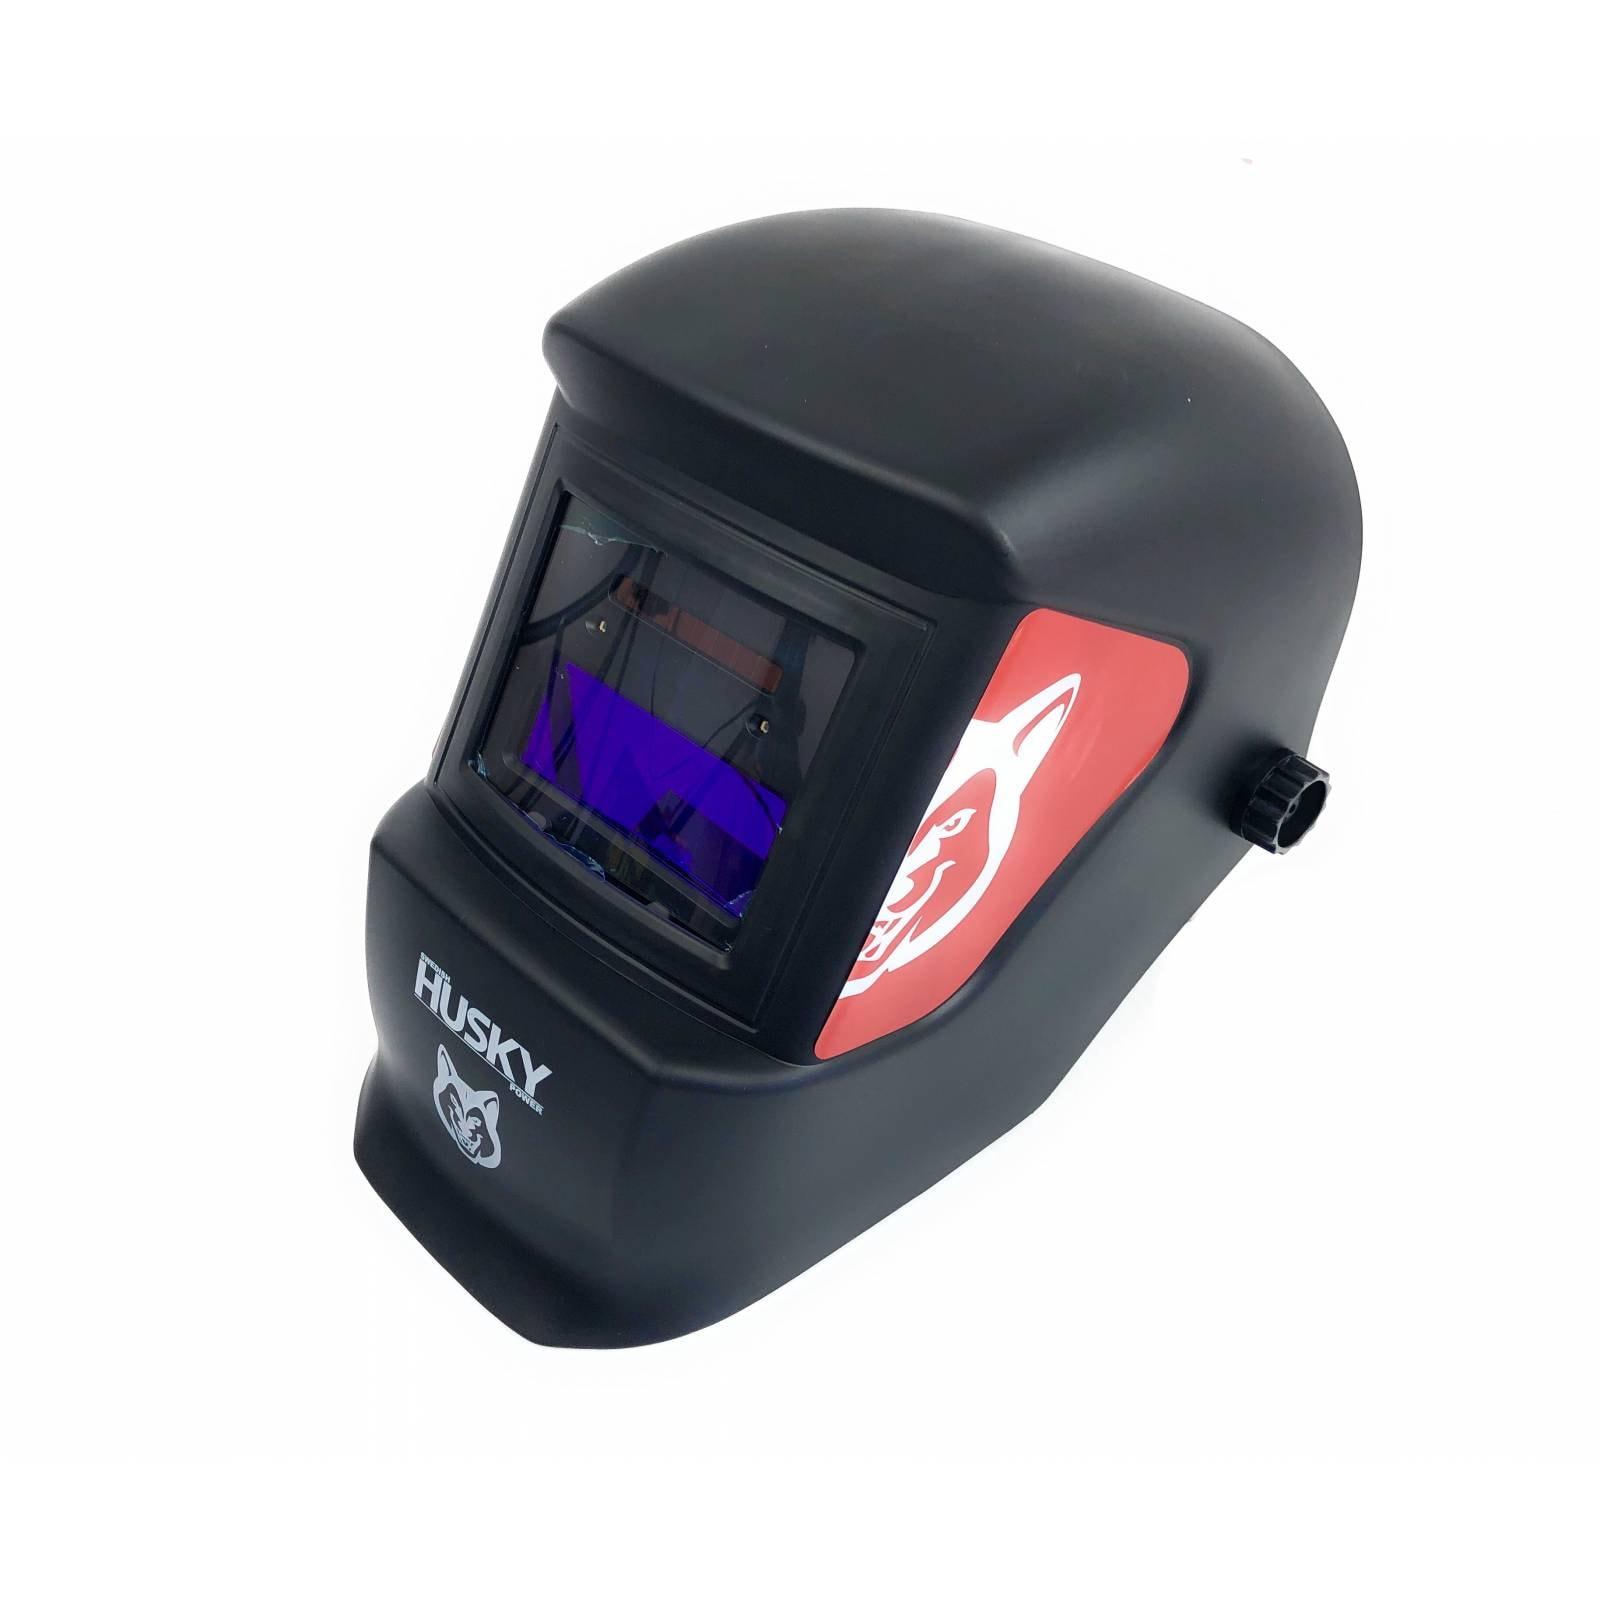 Soldadora Inversora Gladiador 200a 110 220v  Careta HKC10